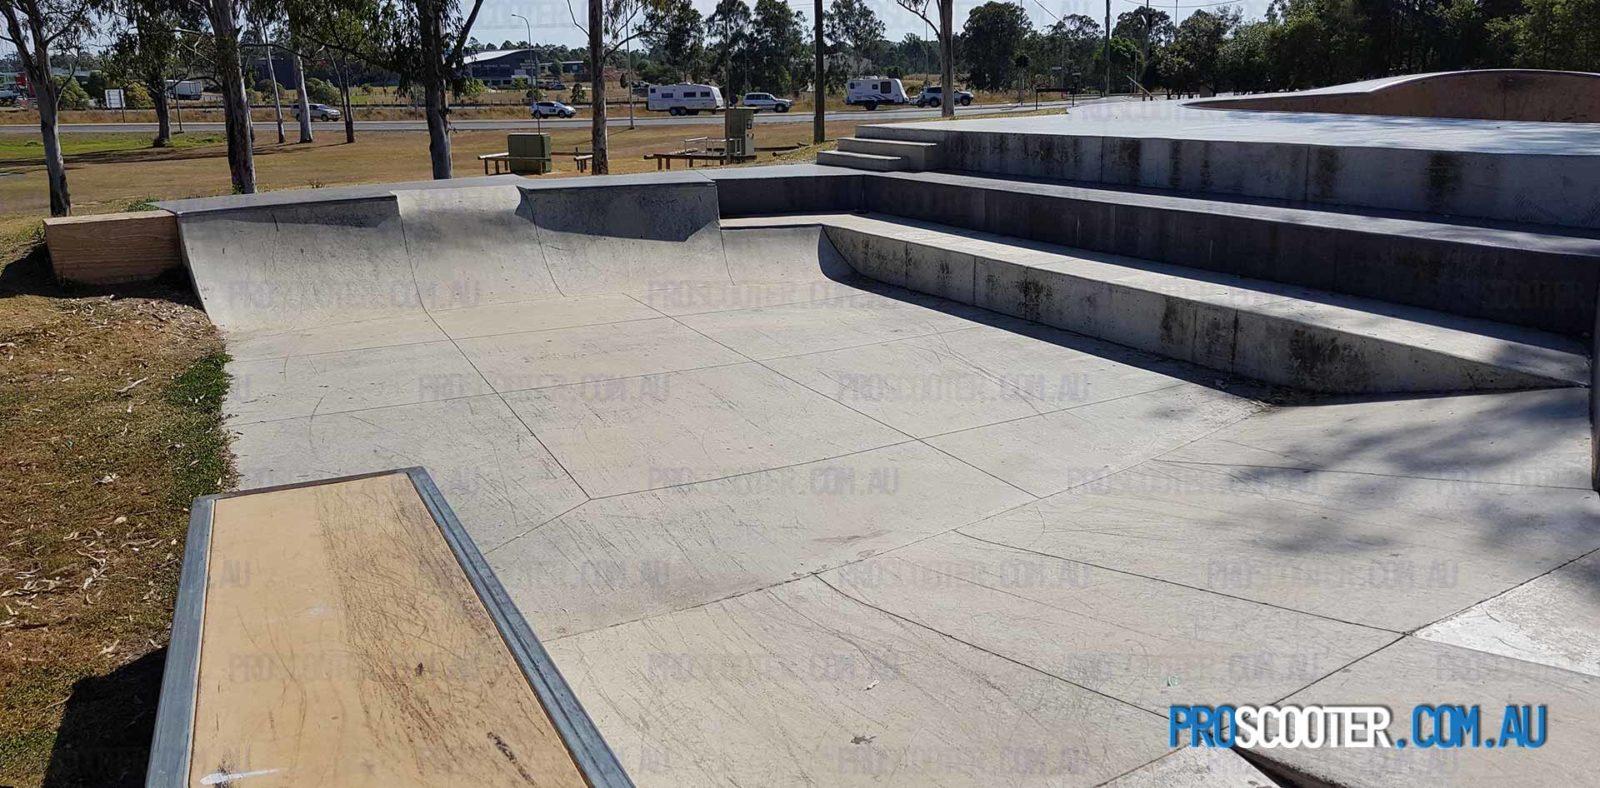 Jimboomba Skatepark New Section